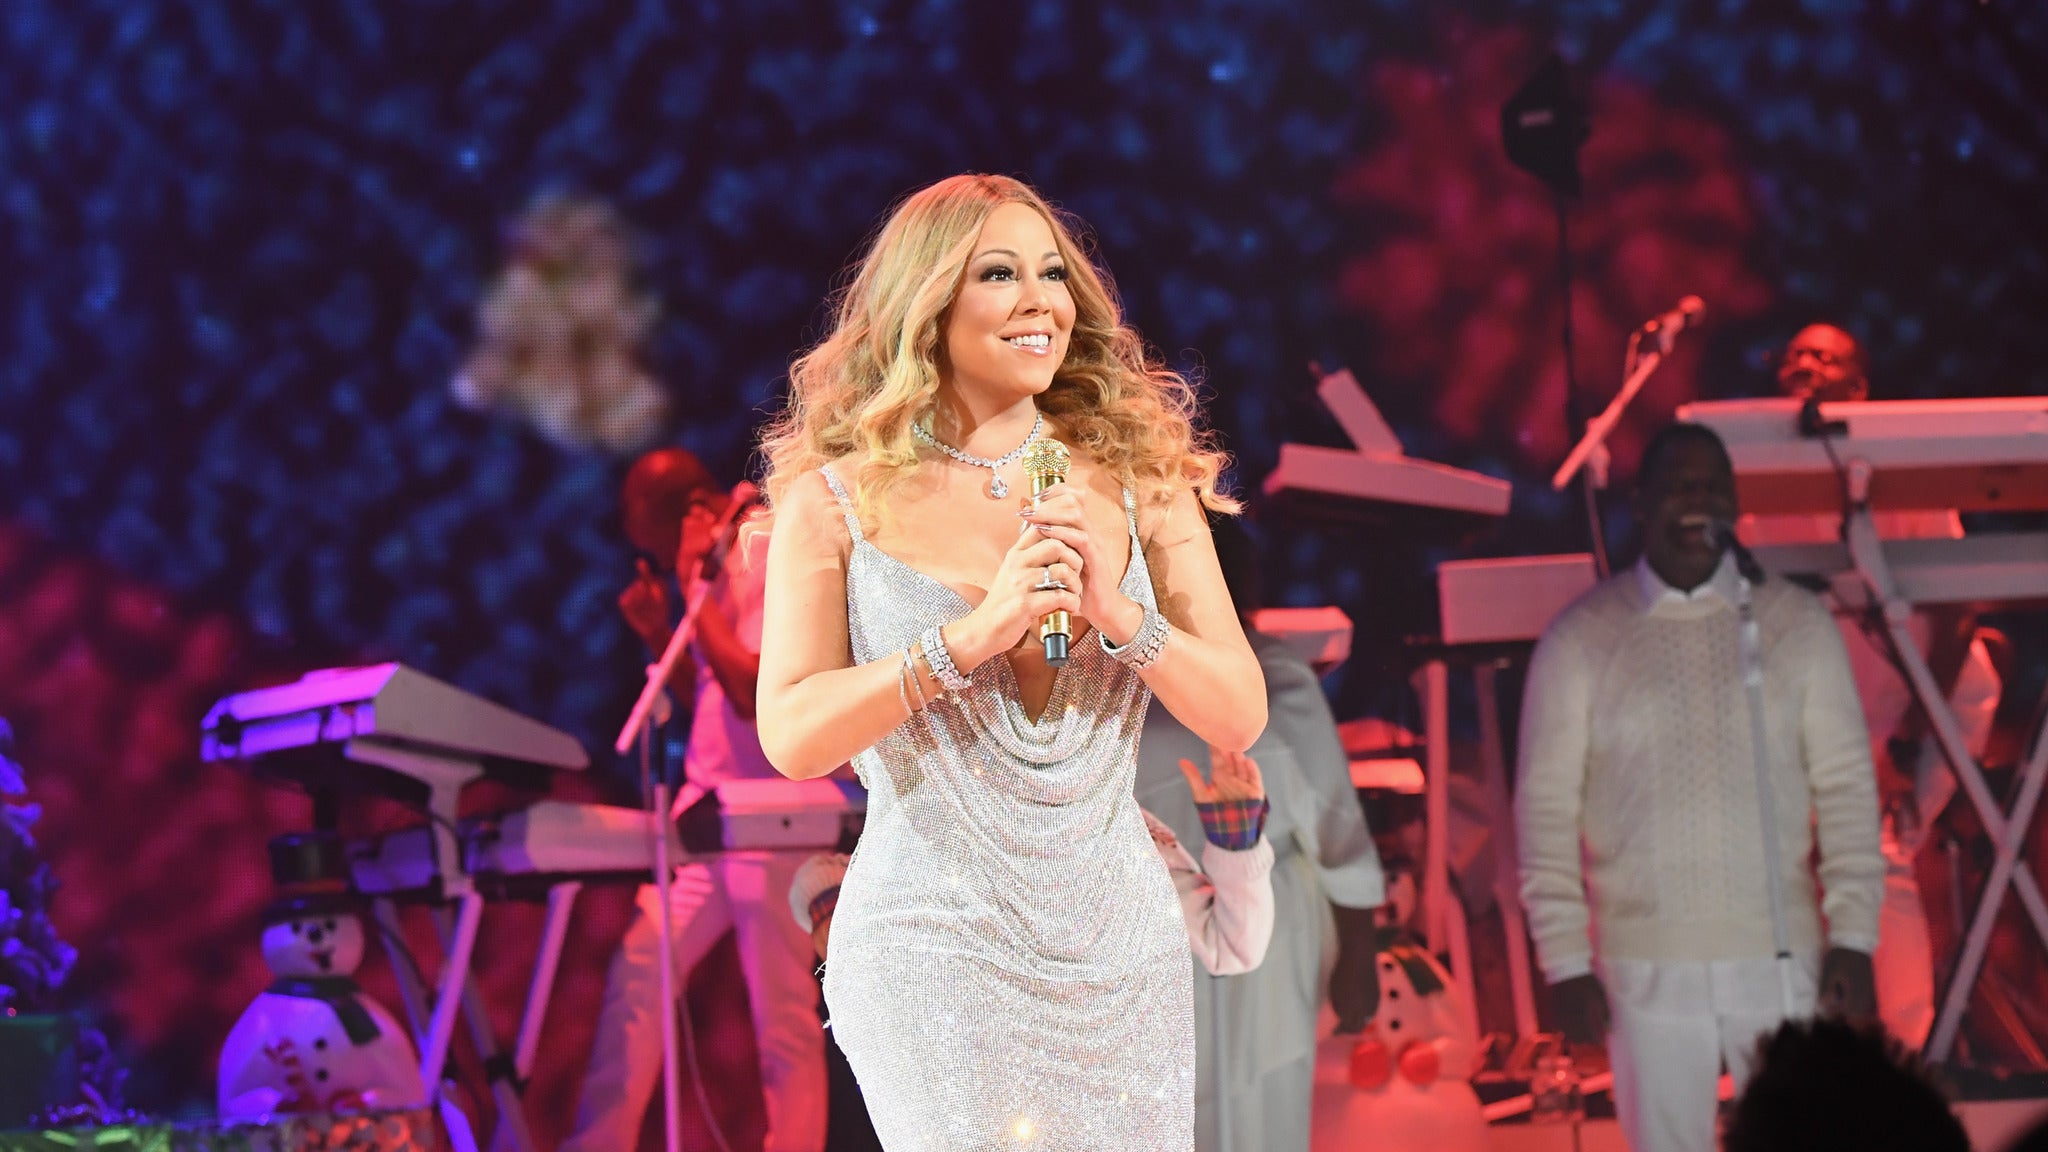 Mariah Carey at The Grand Theater at Foxwoods Resort Casino